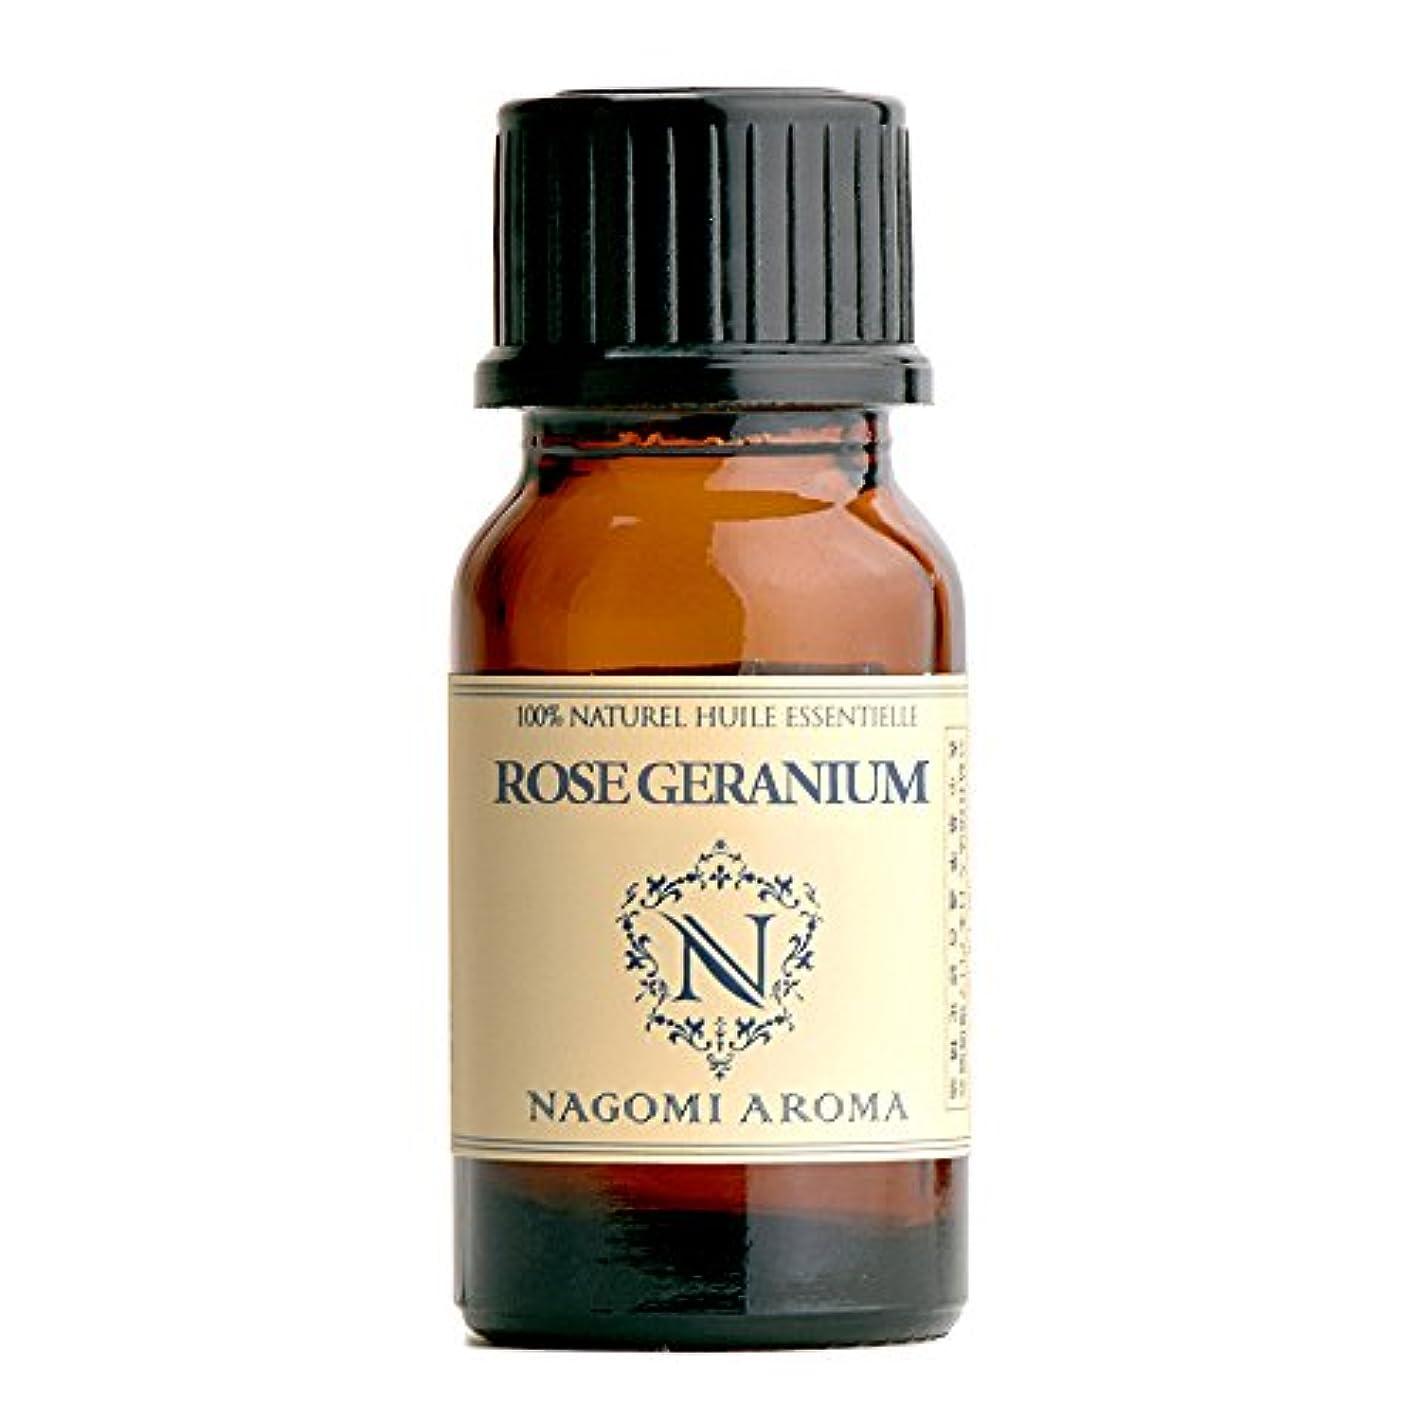 NAGOMI AROMA ローズゼラニウム 10ml 【AEAJ認定精油】【アロマオイル】